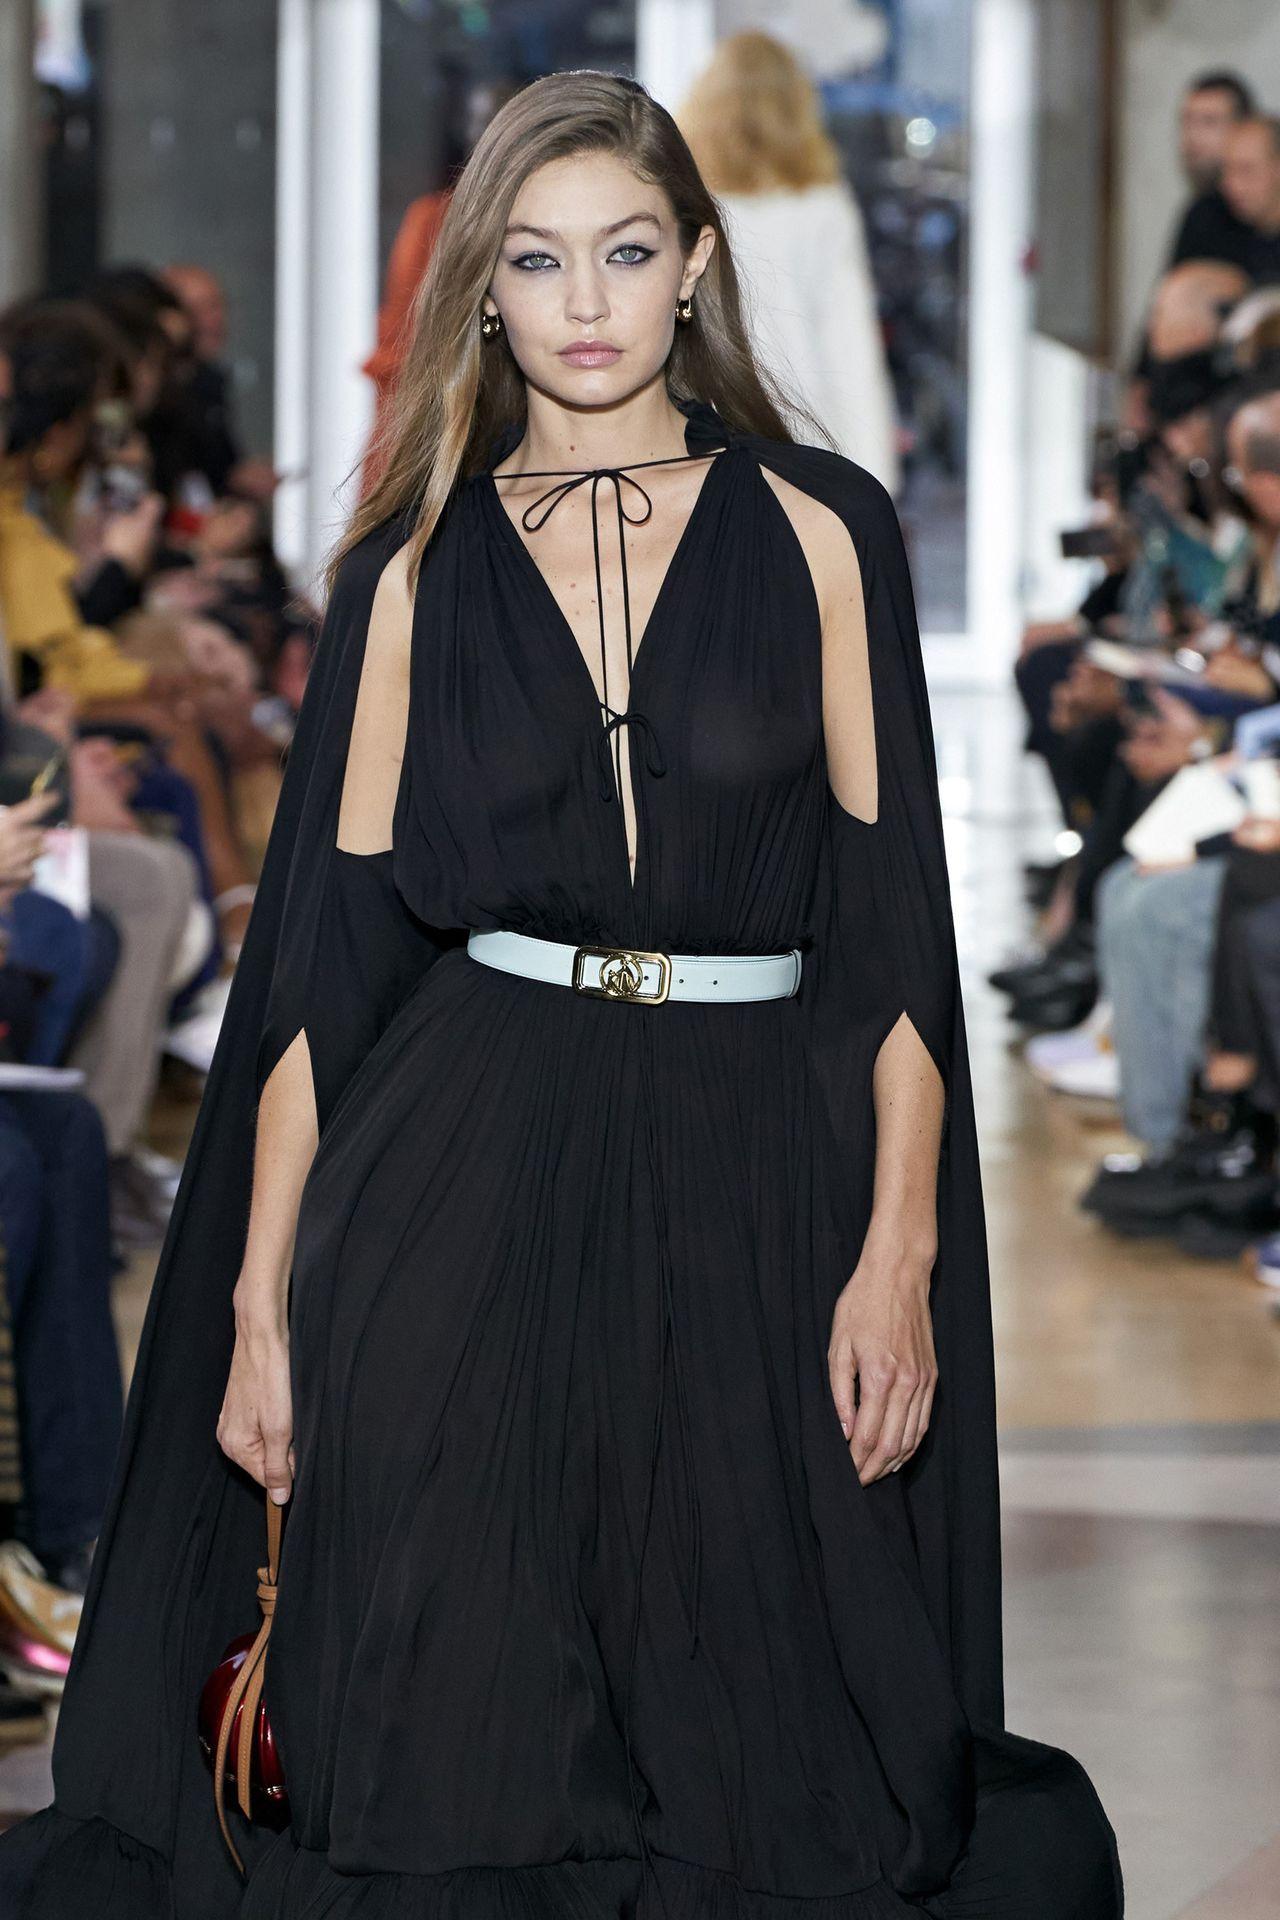 Gigi Hadid Seen Walking The Lanvin Catwalk In Paris 0008